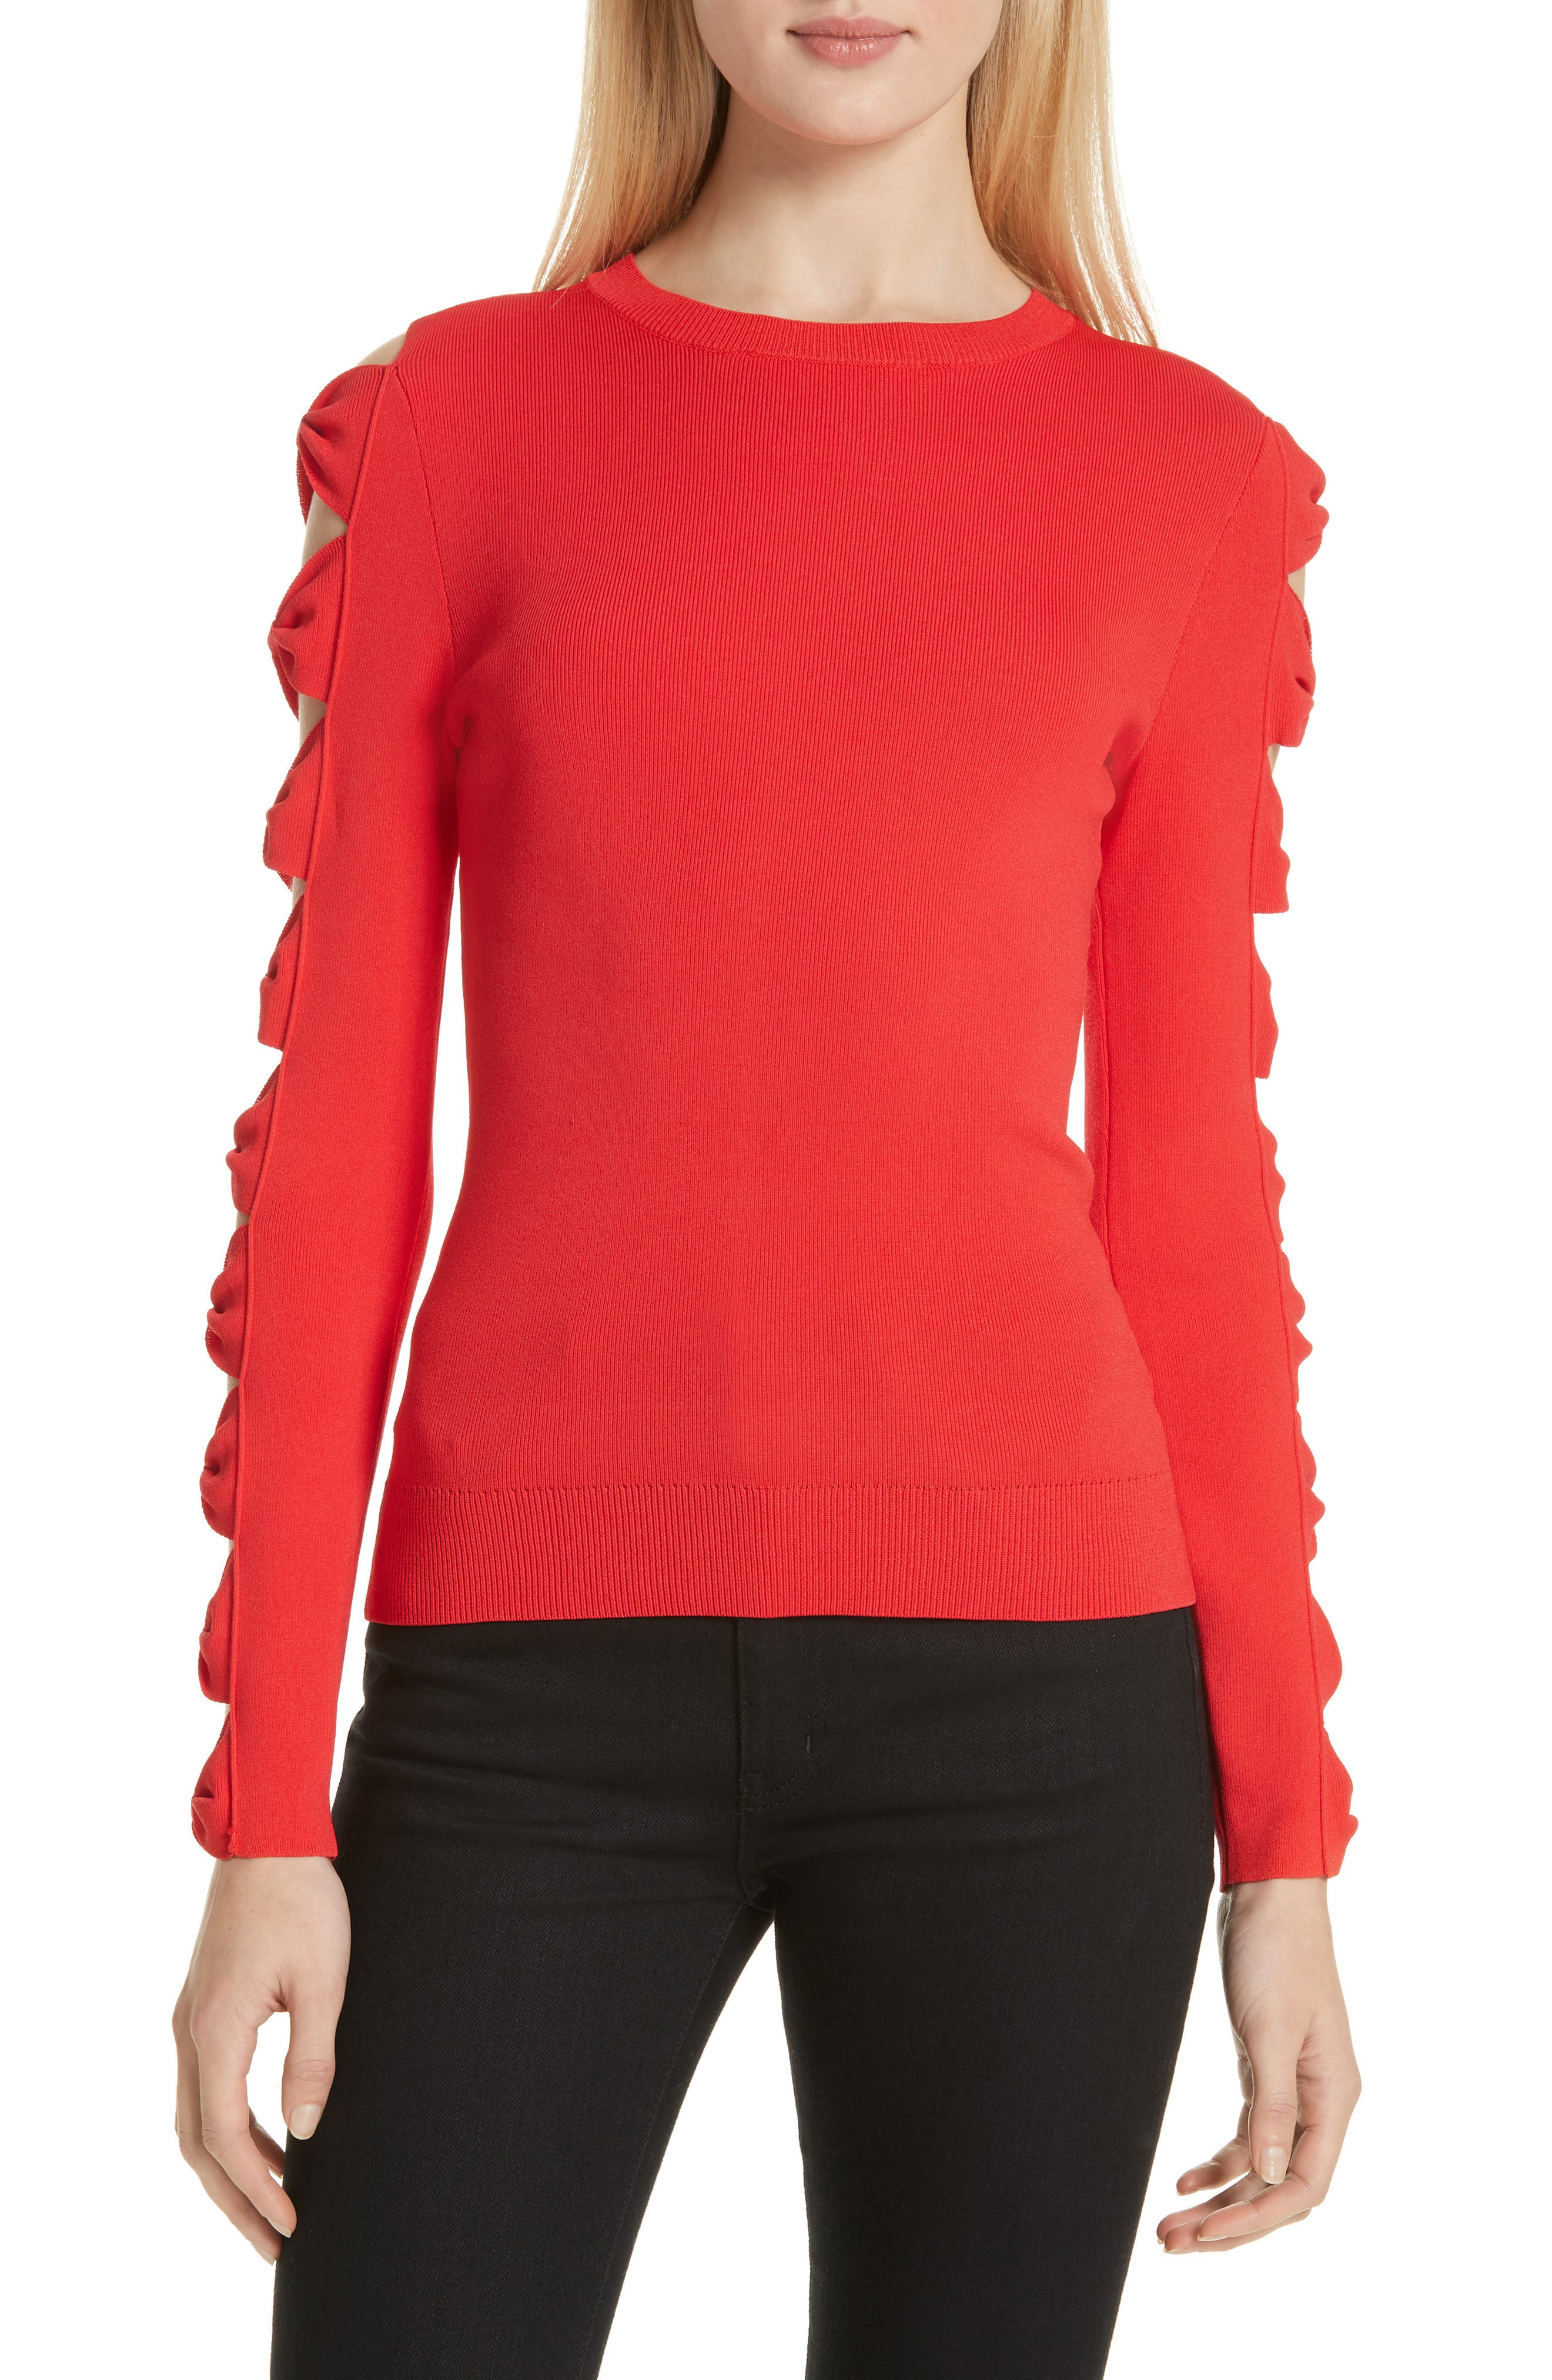 Yonoh Cutout Sleeve Sweater,                             Main thumbnail 1, color,                             600